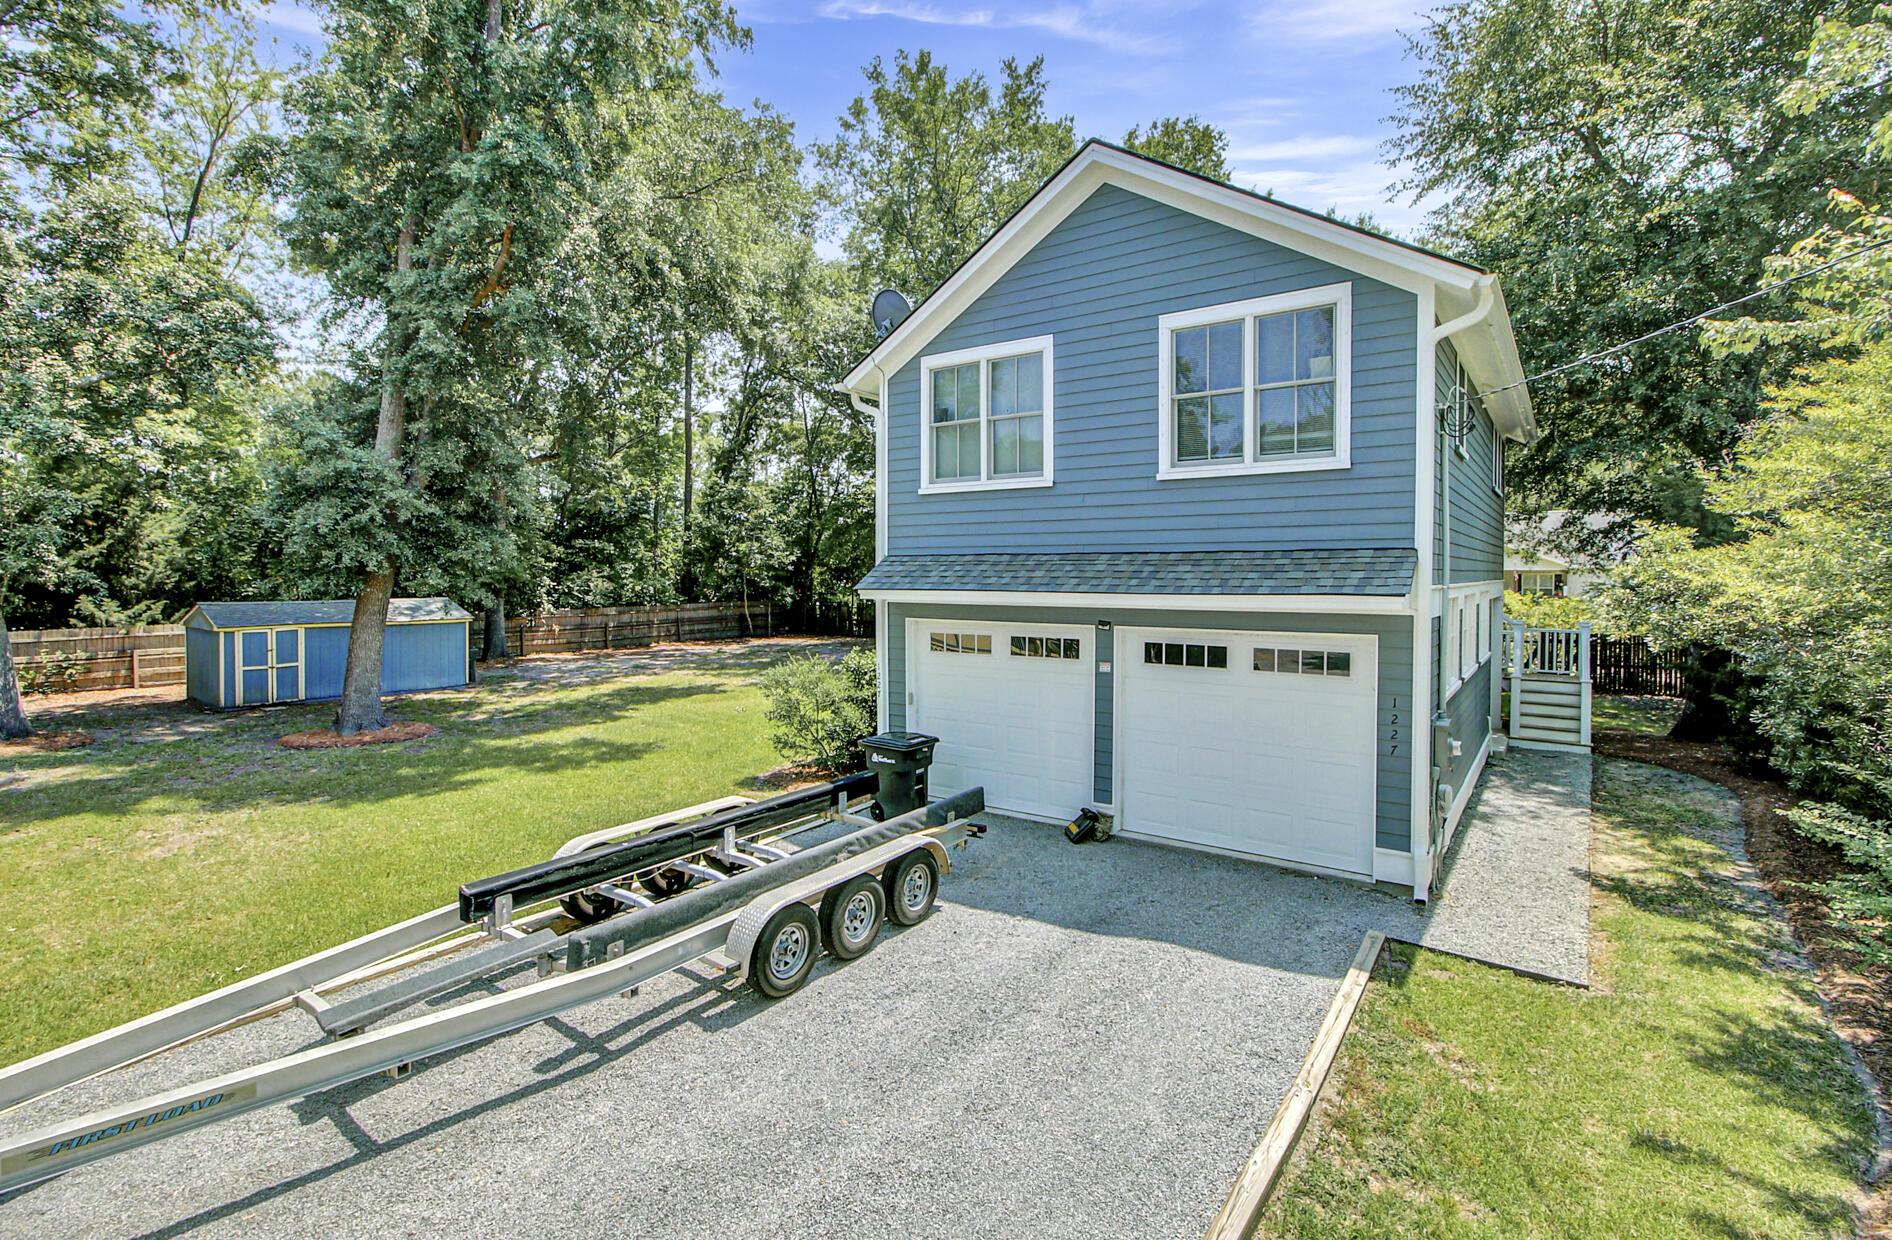 Yaugh Hall Homes For Sale - 1229 Porchers Bluff, Mount Pleasant, SC - 40